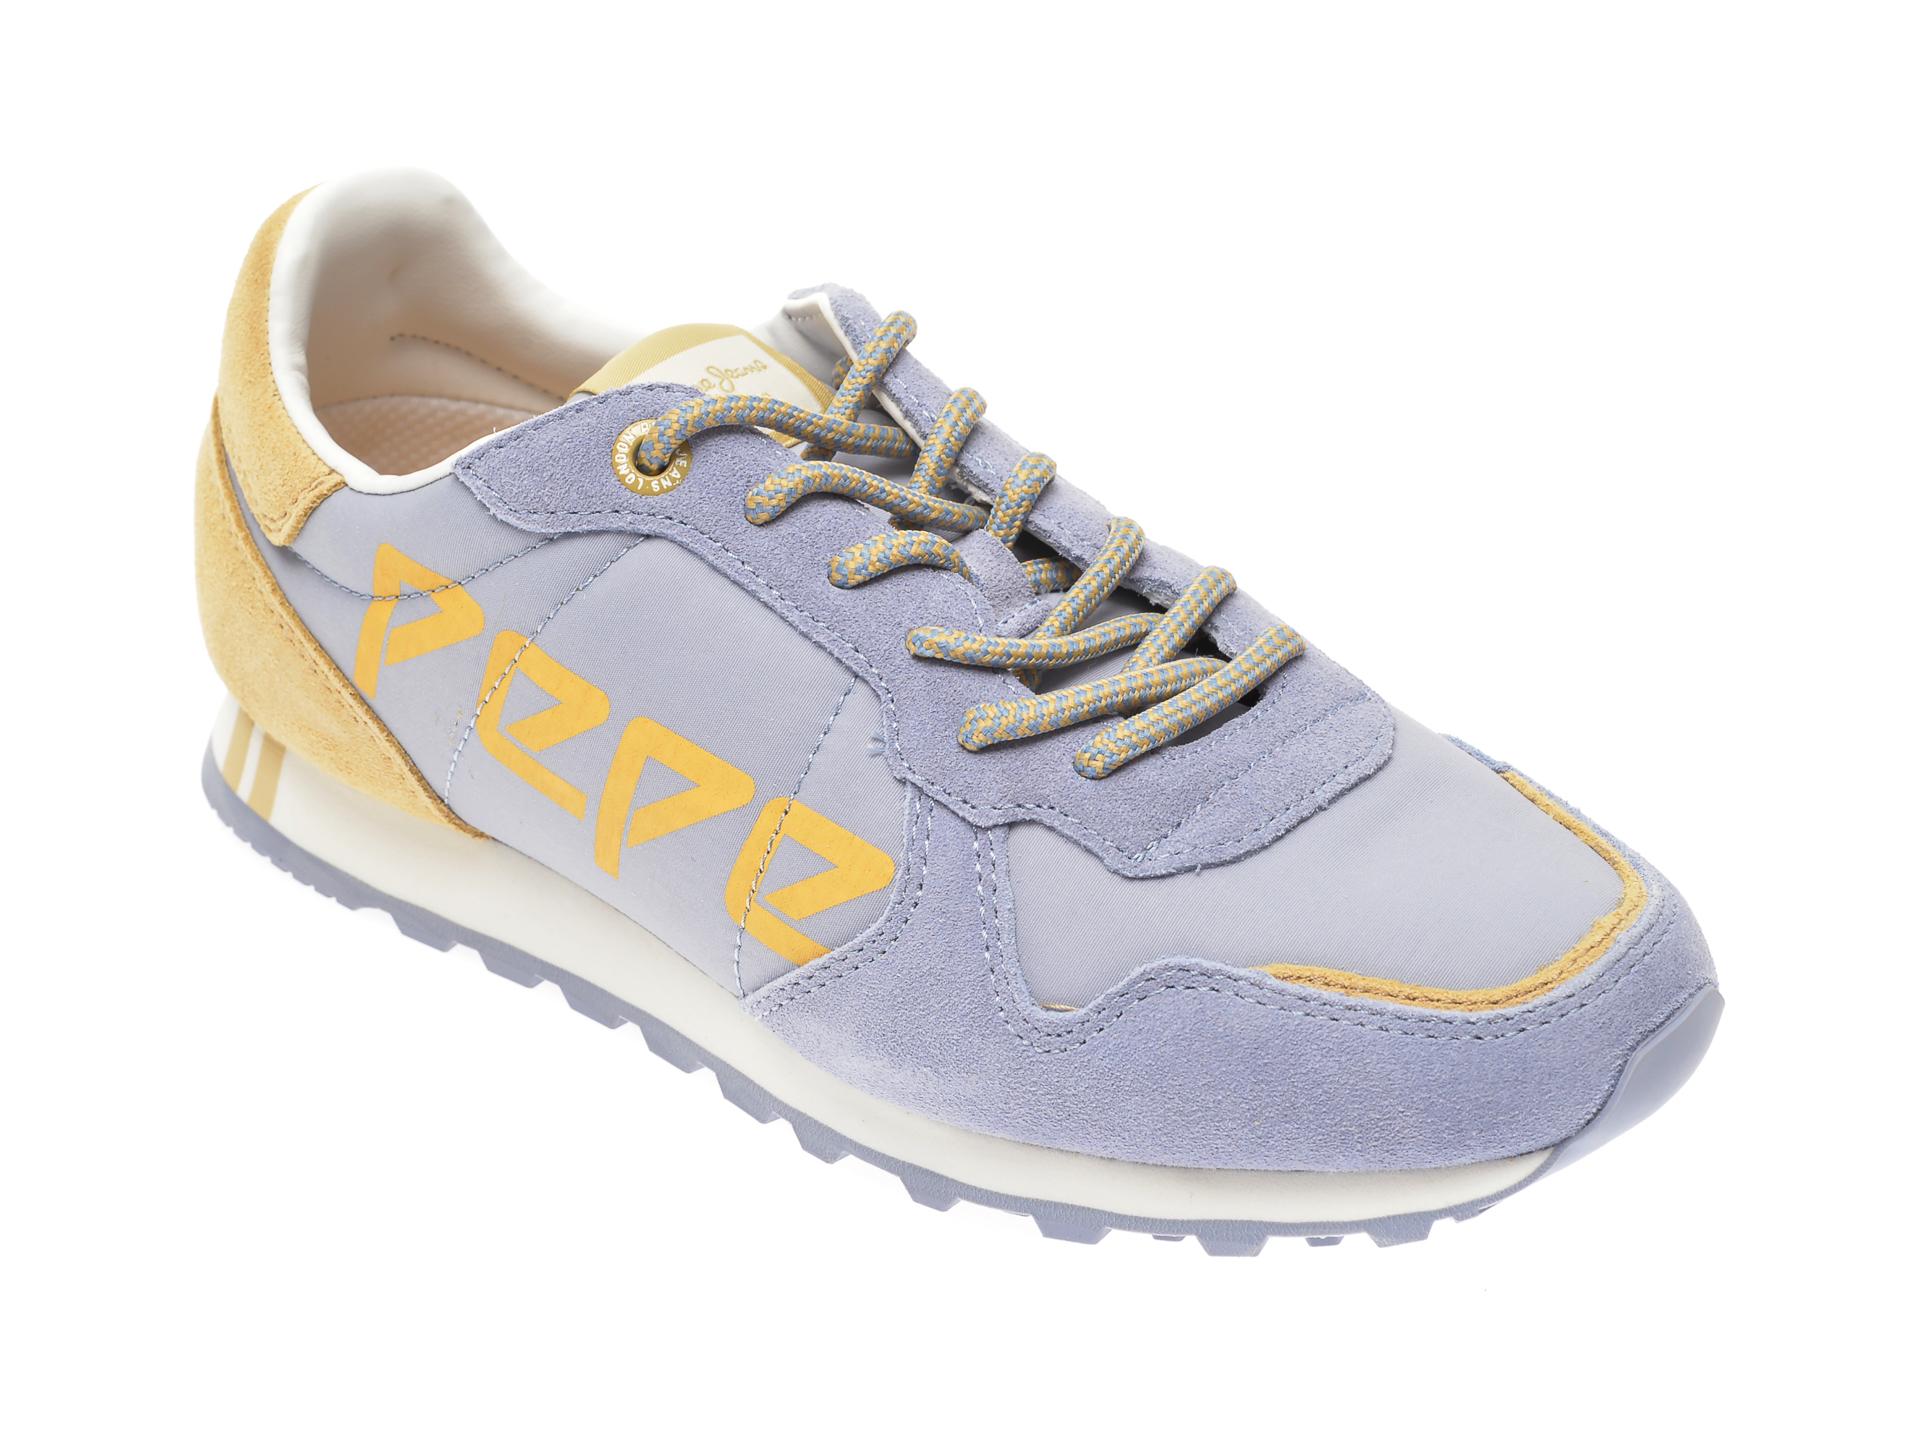 Pantofi sport PEPE JEANS albastri, LS30984, din material textil si piele intoarsa